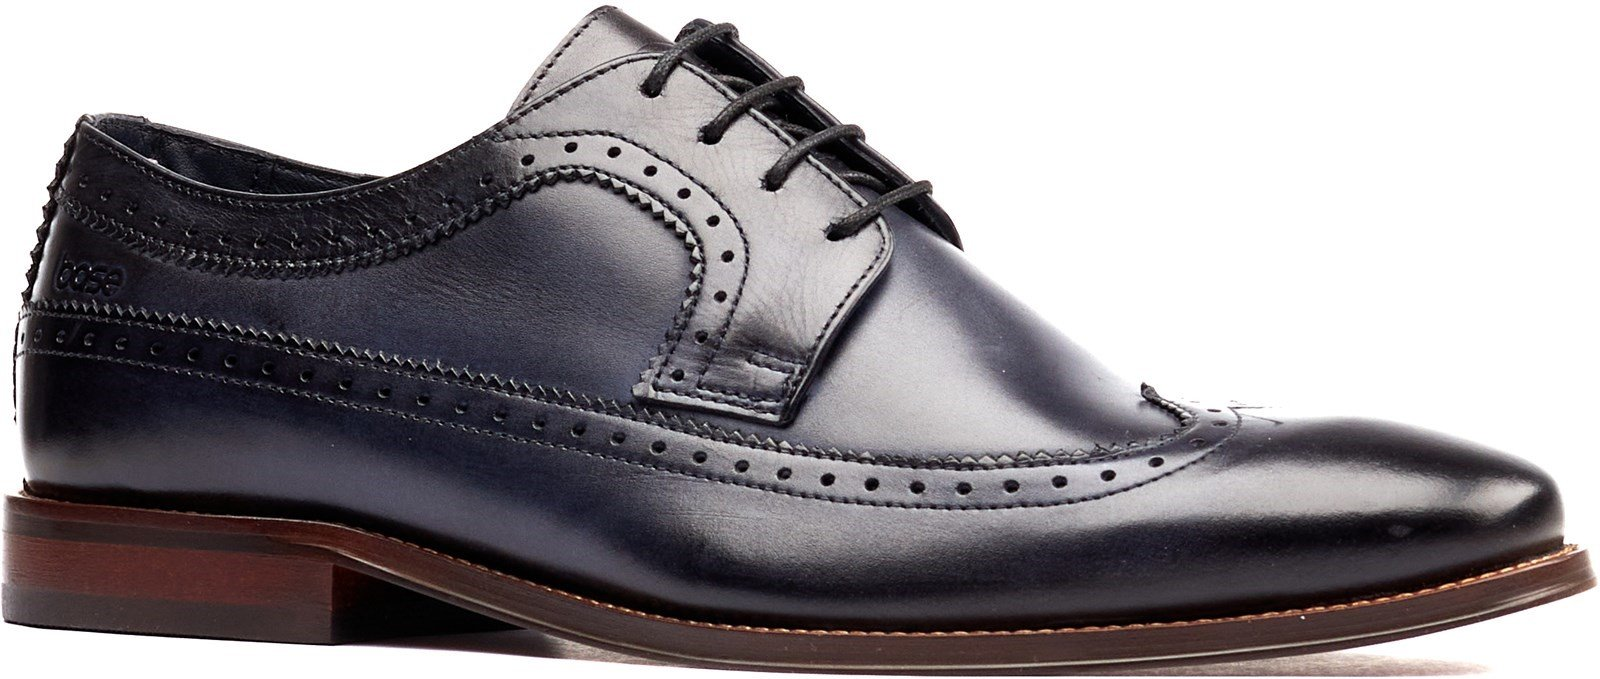 Base London Men's Havisham Plain Toe Derby Shoe Various Colours 32247 - Navy 7